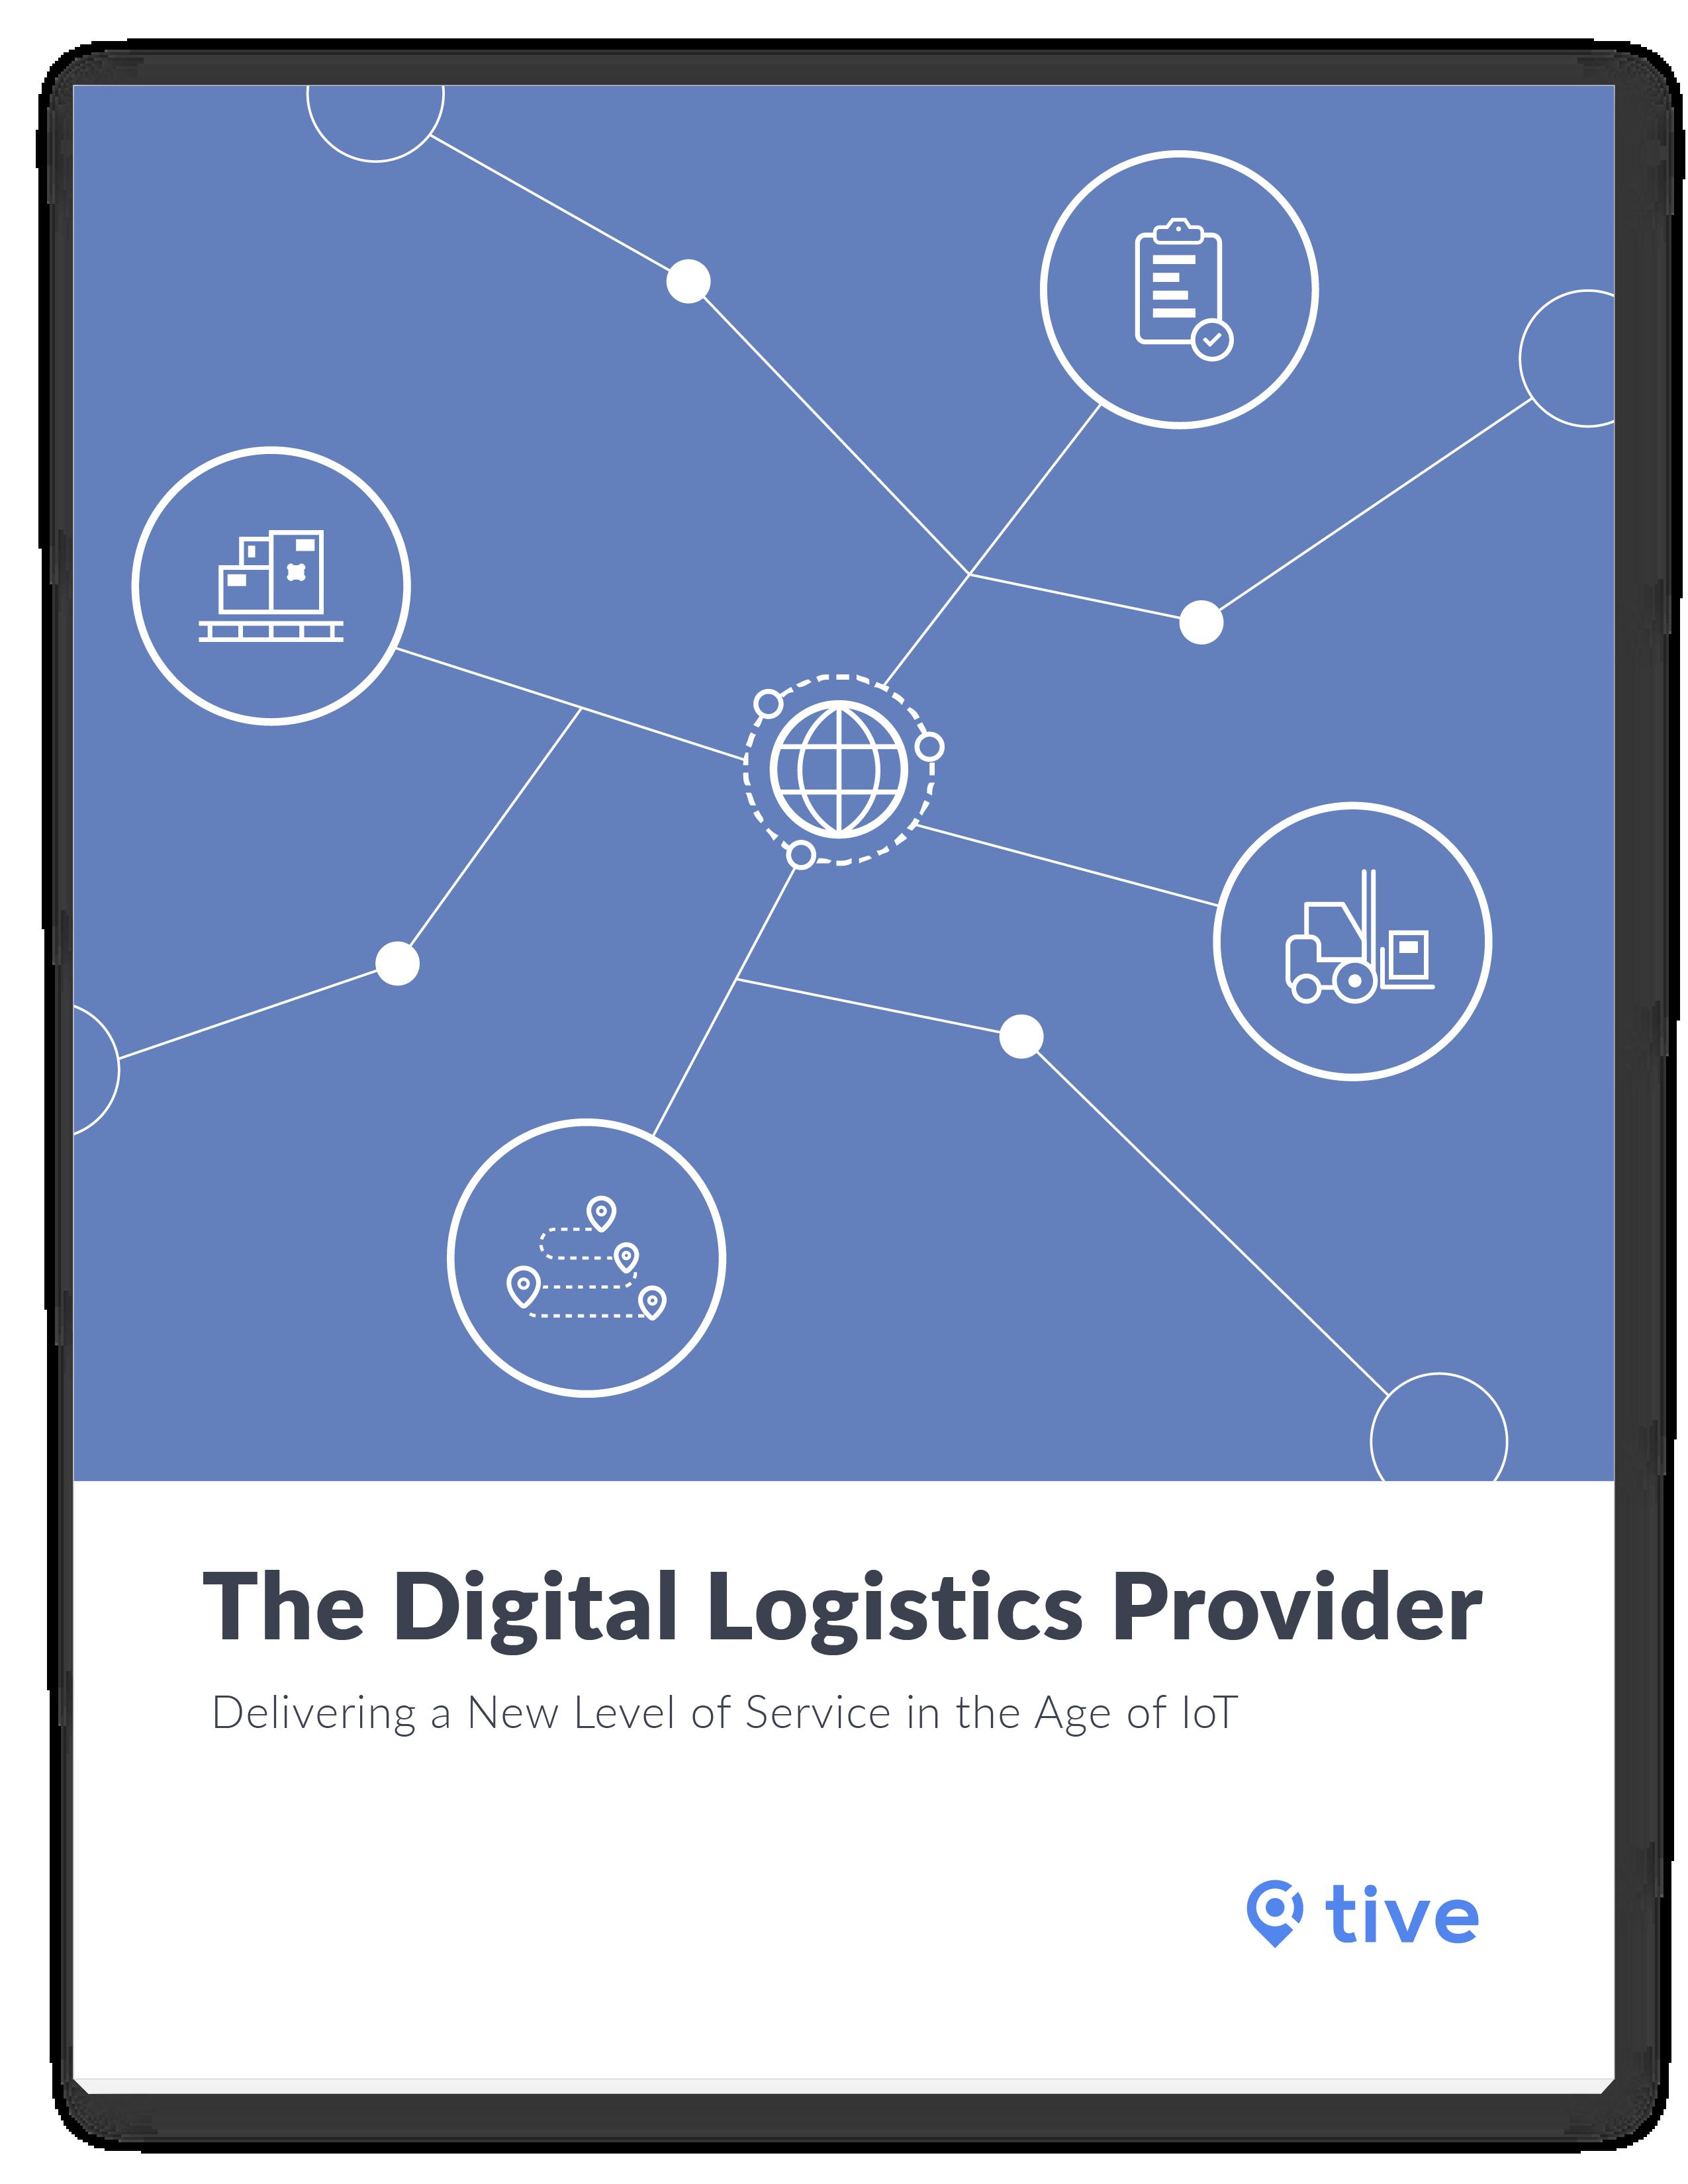 Tive - Digital Logistics Provider - Cover Image.png